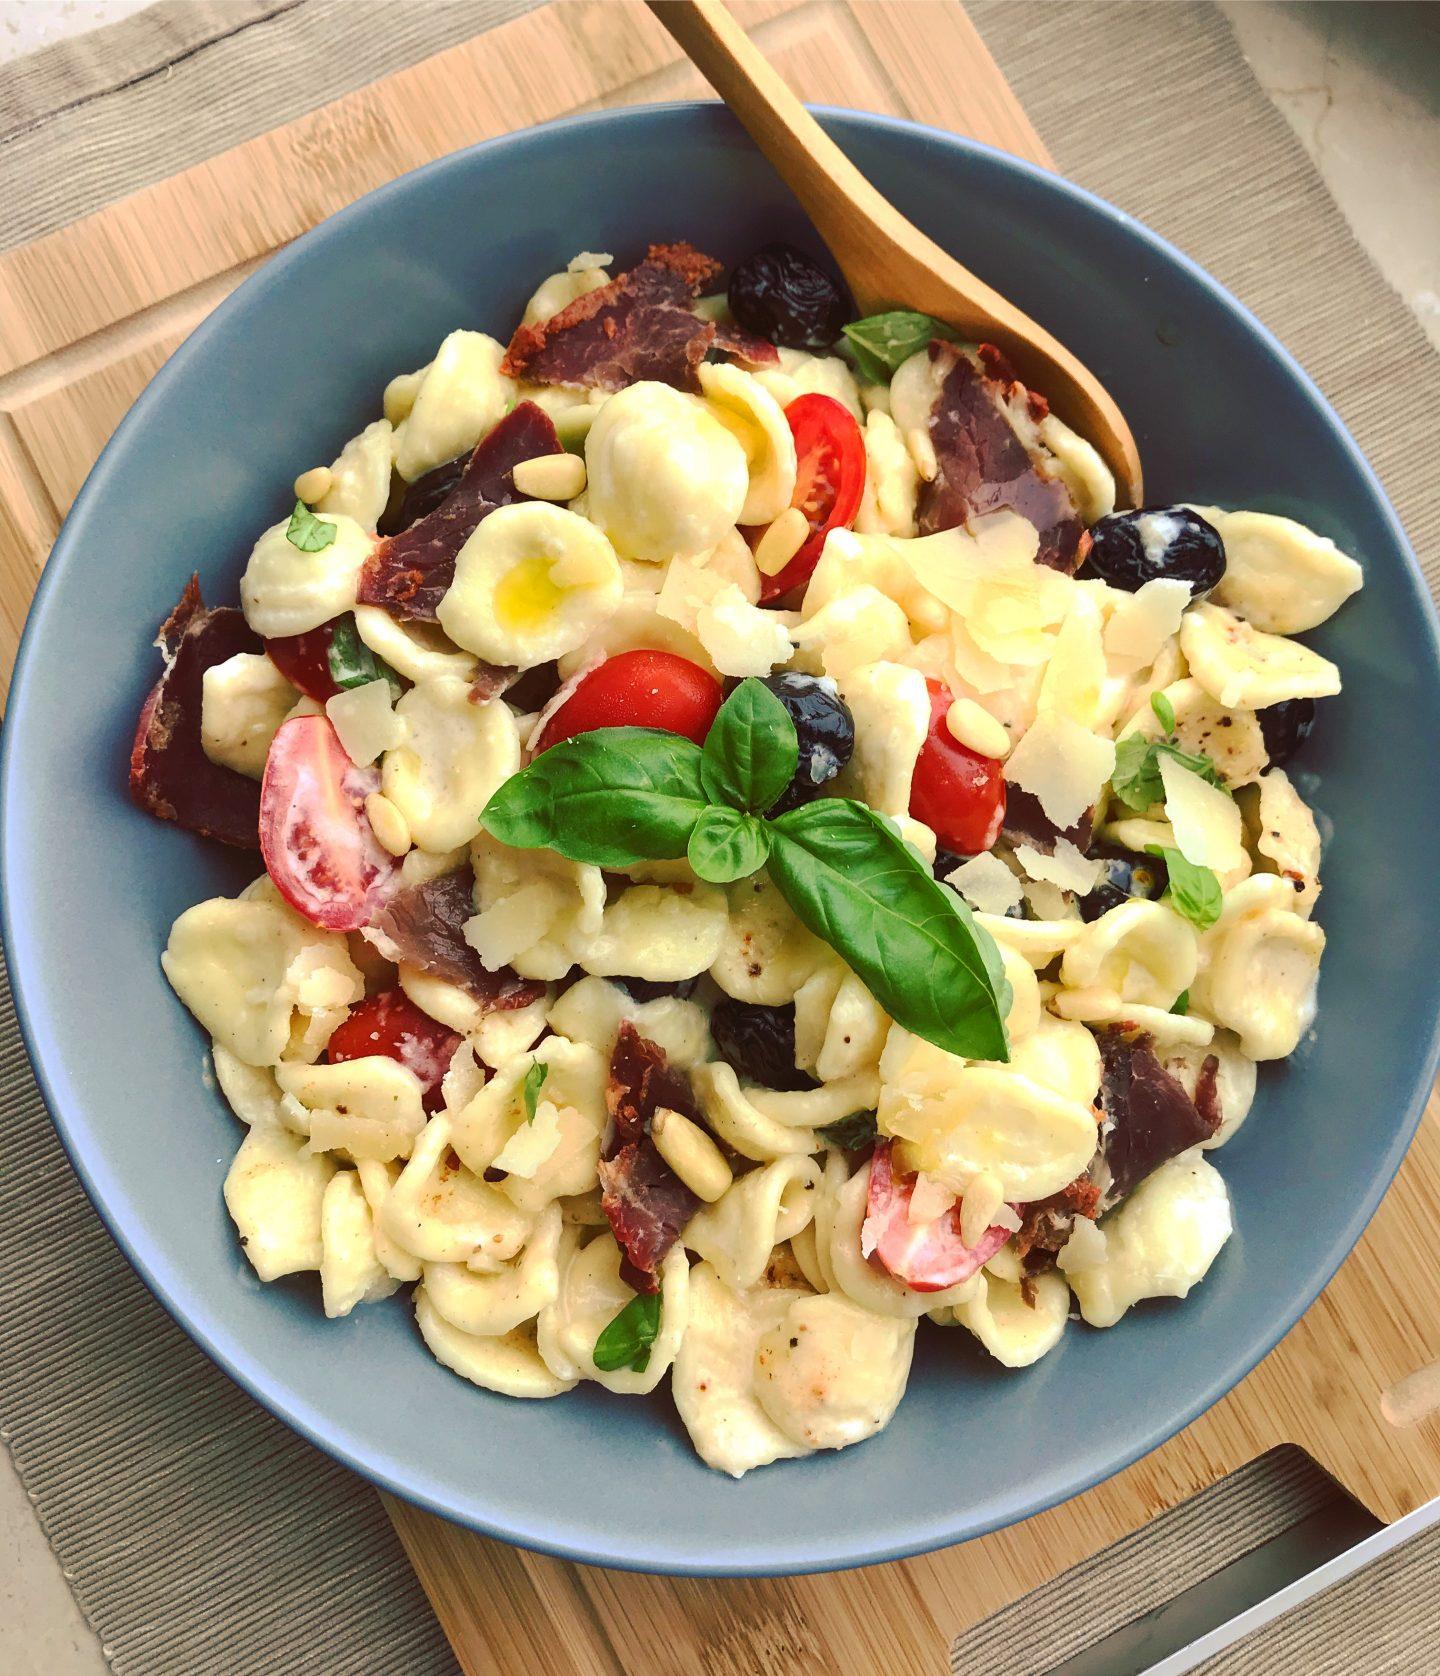 15-Minuten Parmesan-Trüffel Orecchiette